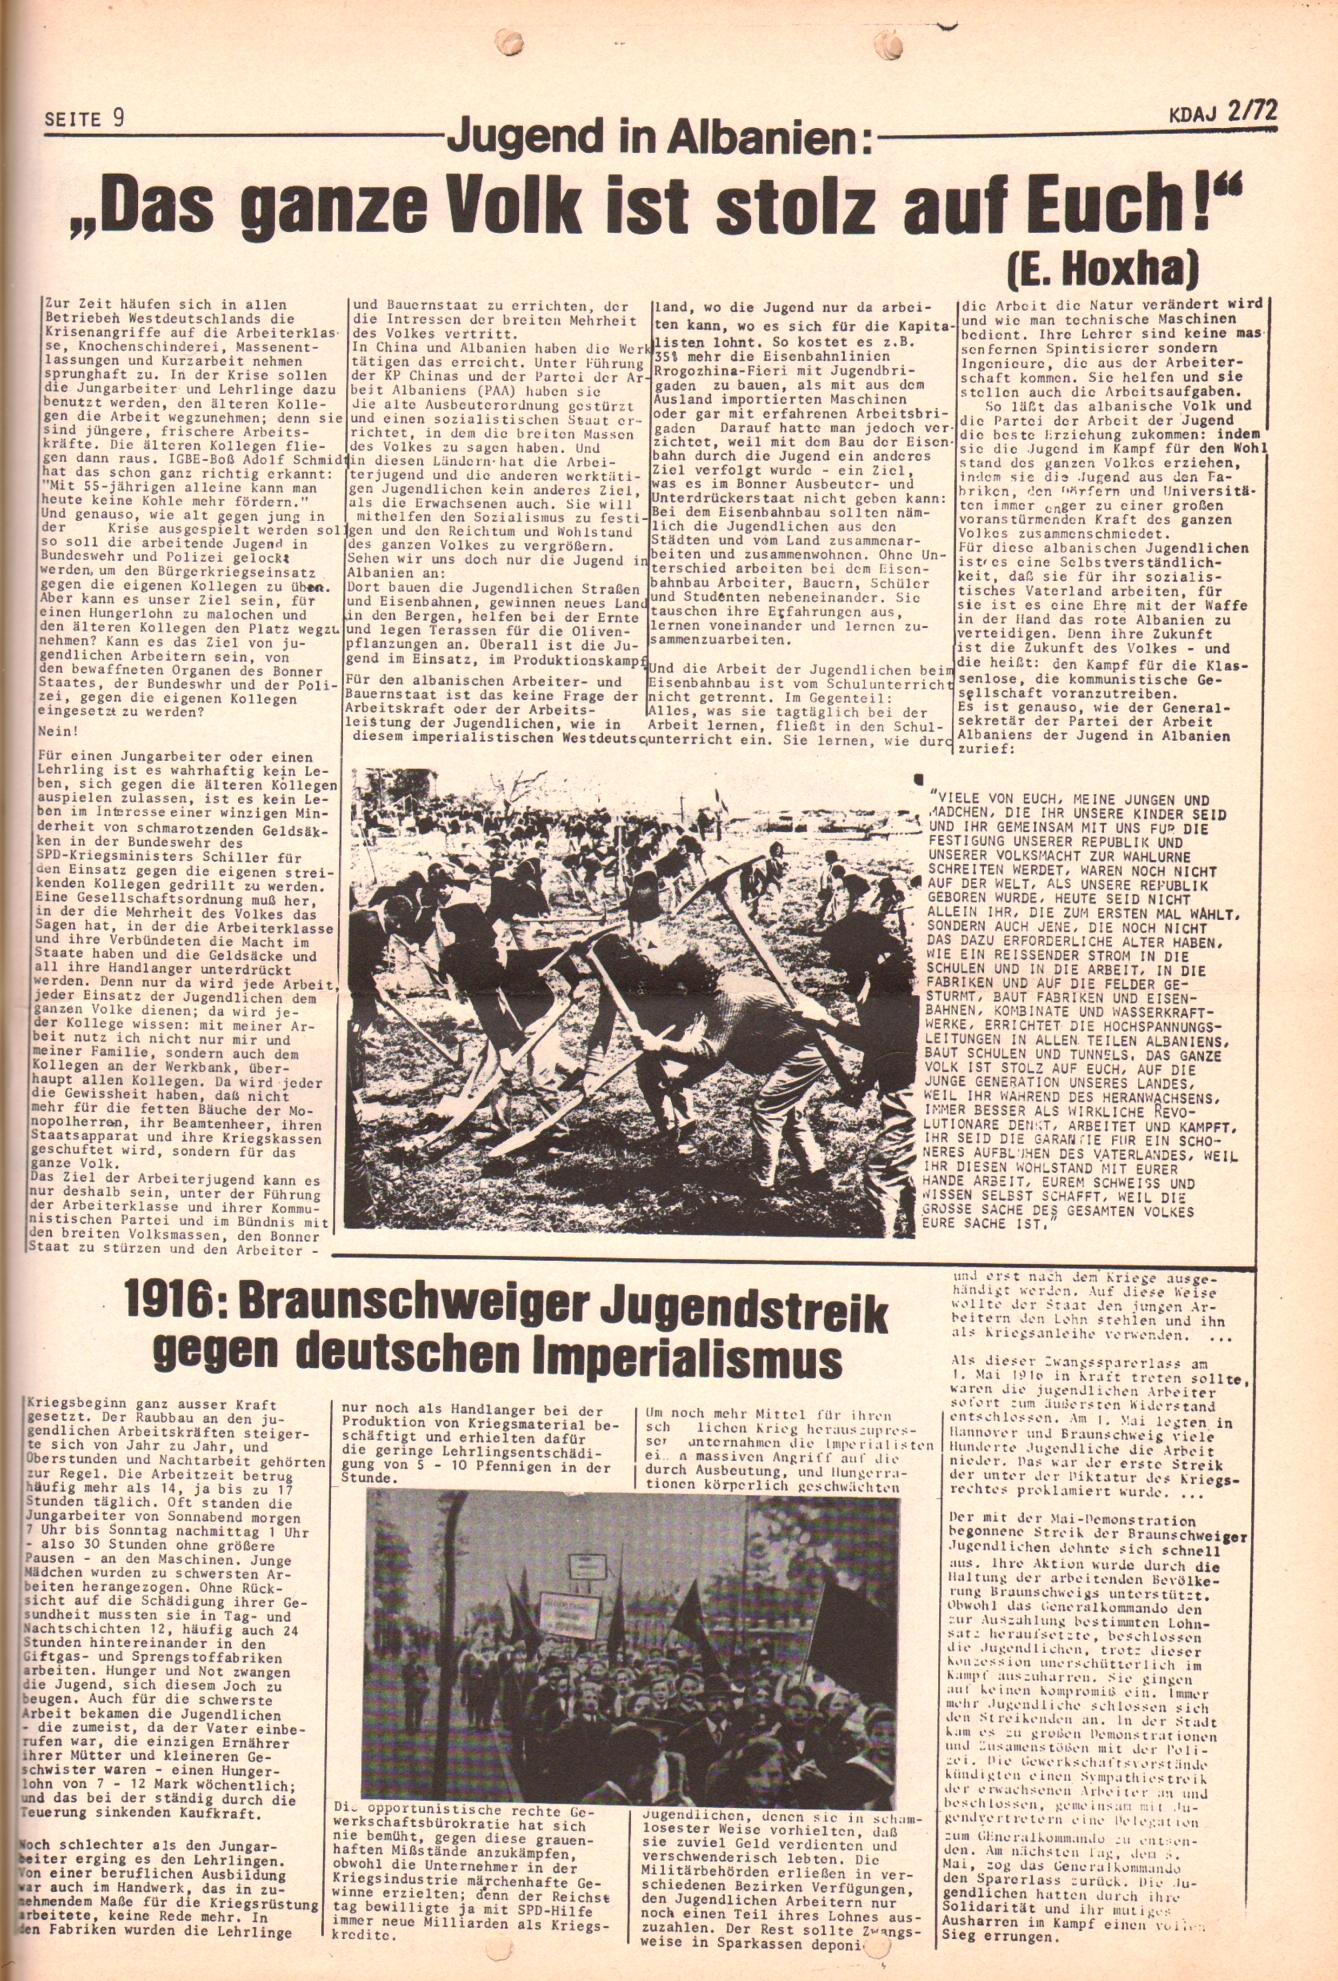 KDAJ, 3. Jg., März 1972, Nr. 2, Seite 9